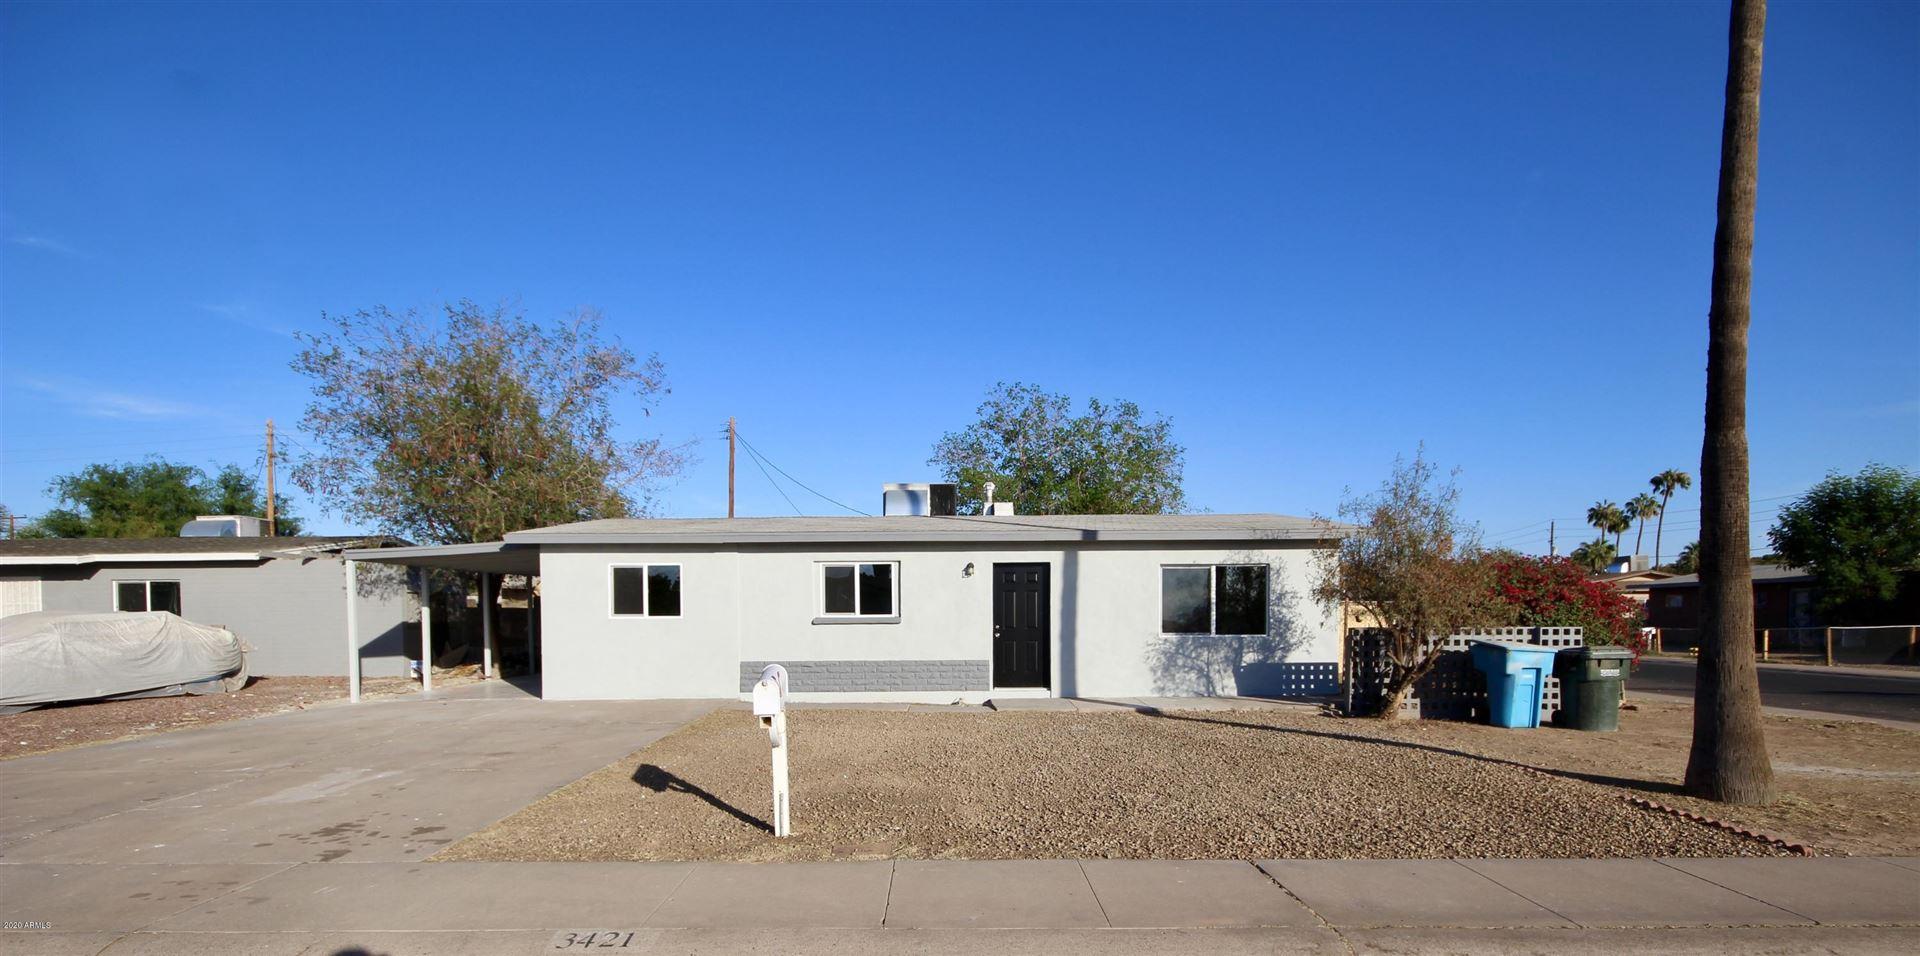 3421 N 76TH Avenue, Phoenix, AZ 85033 - MLS#: 6156920